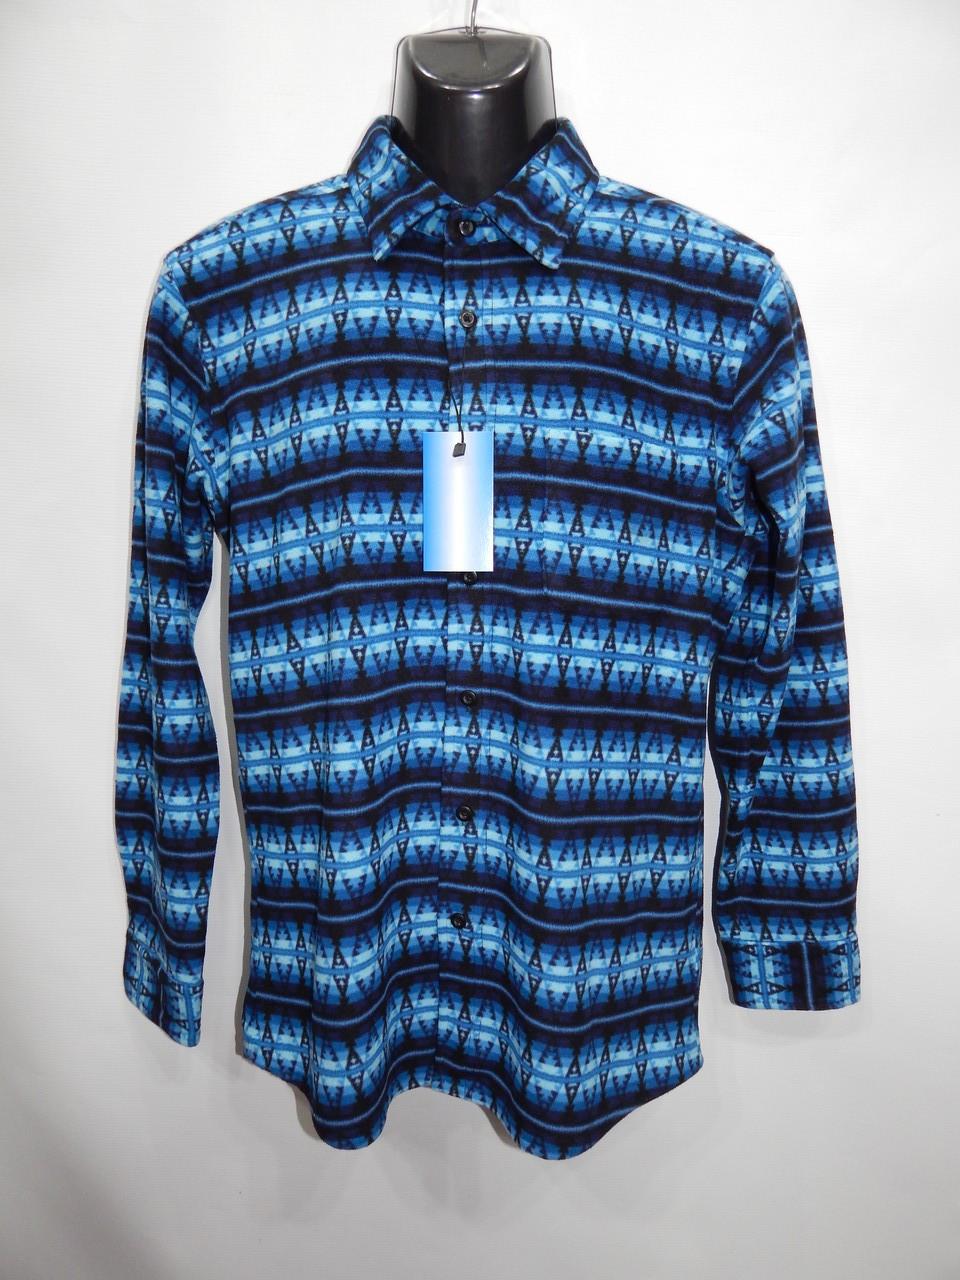 Мужская теплая флисовая рубашка Uniqlo оригинал р.48-50 053RT